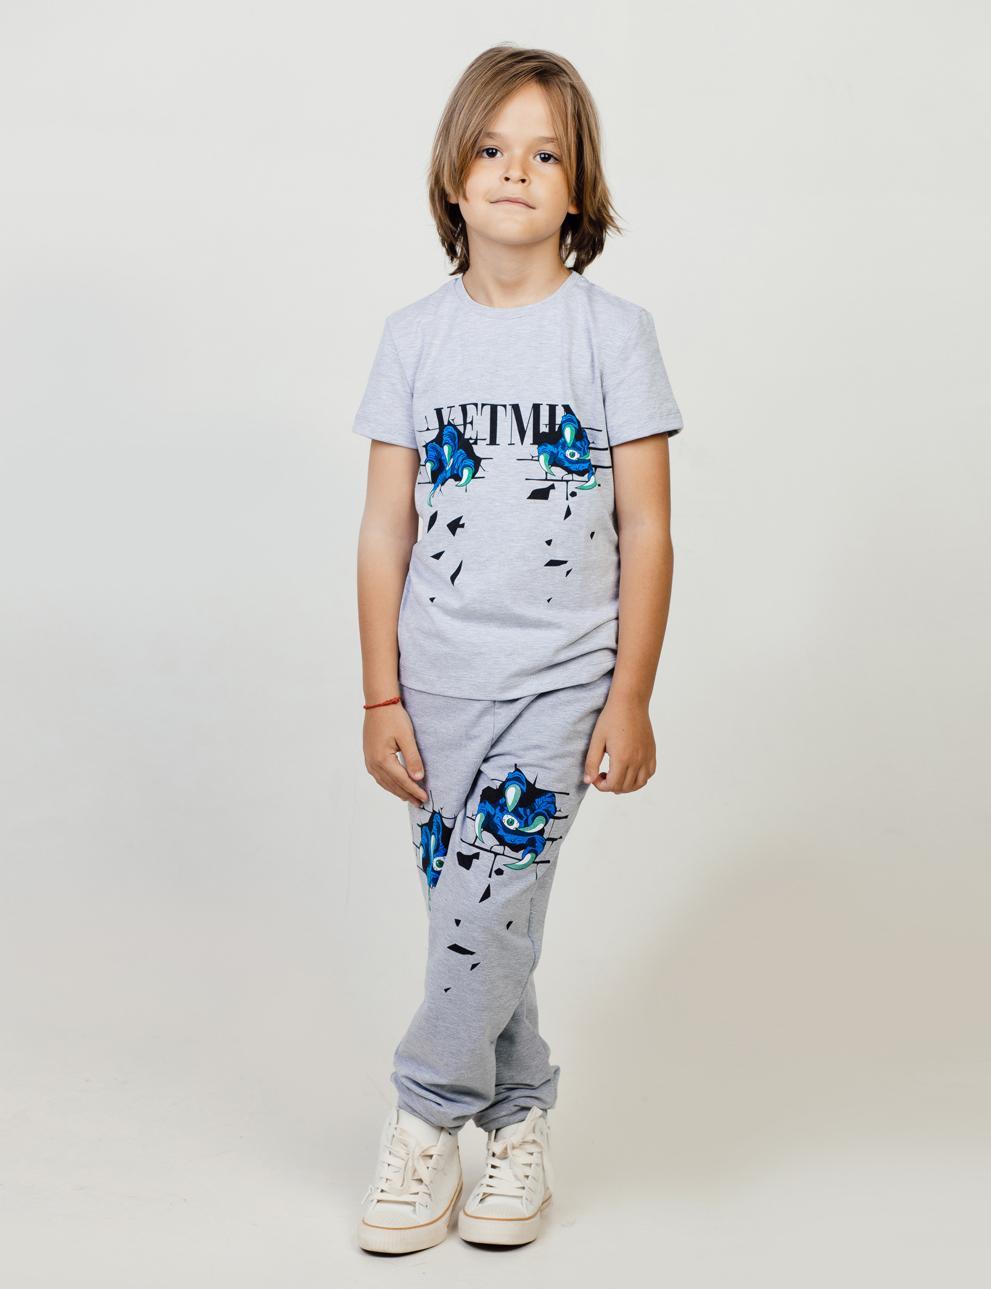 Костюм для мальчика KETMIN Когти цв.Серый